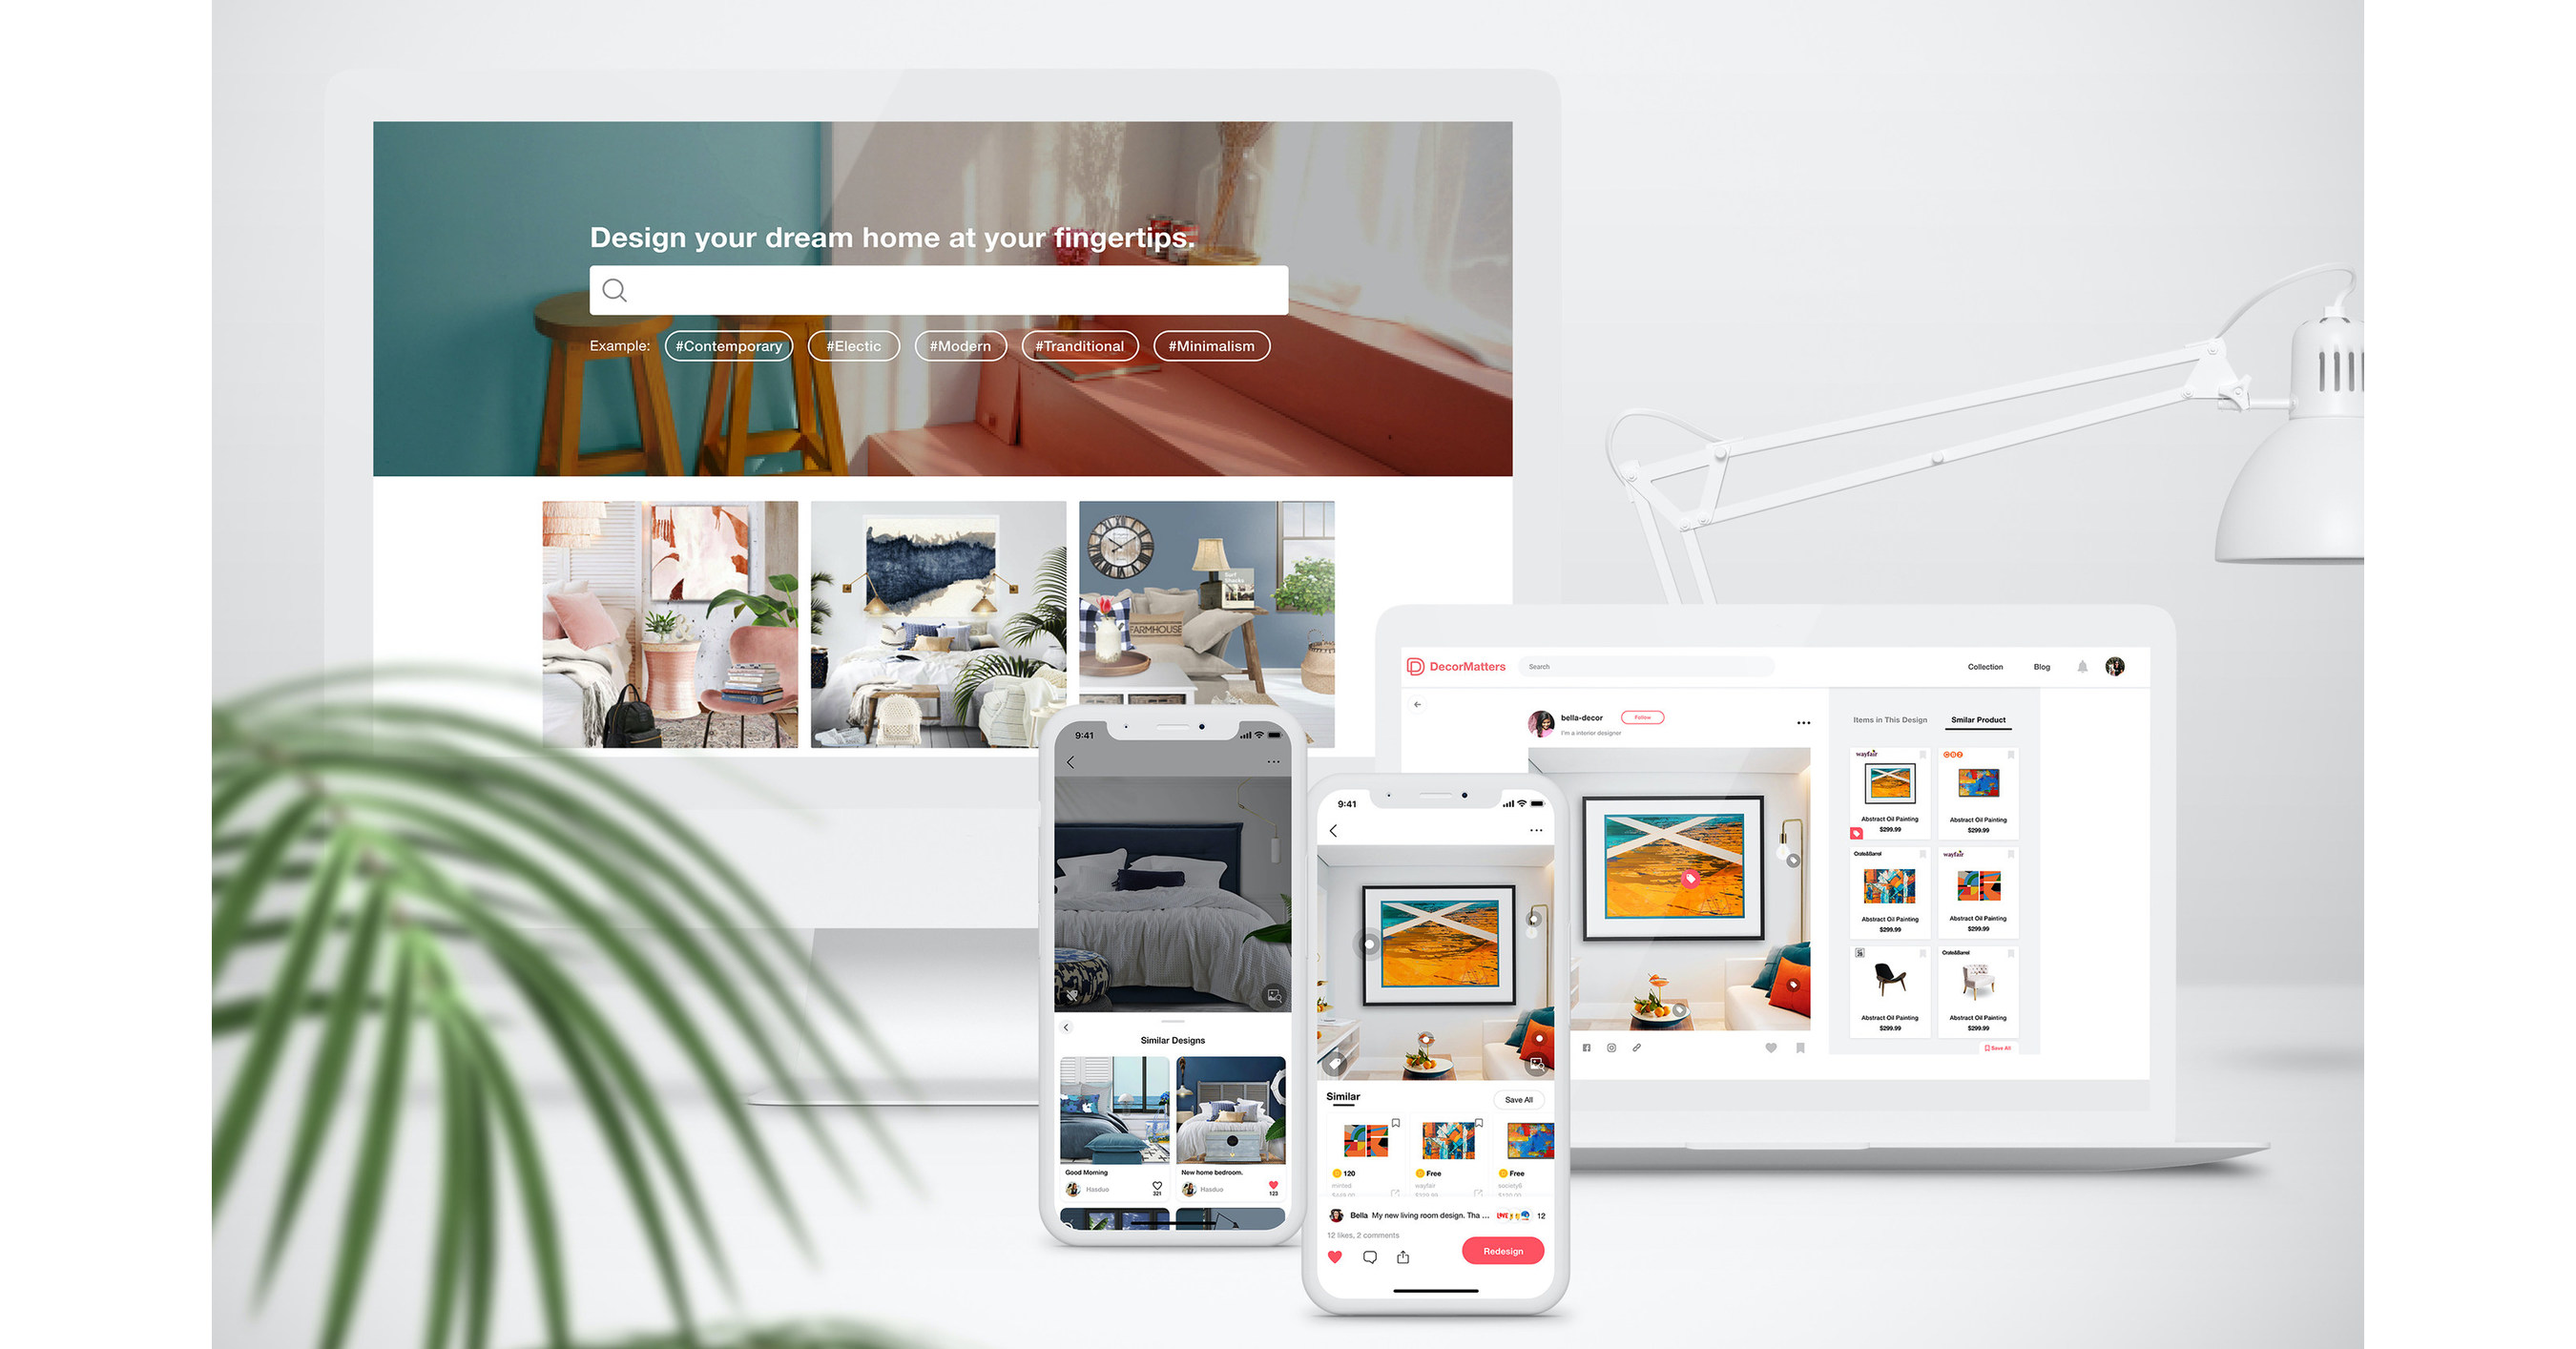 DecorMatters Announces AI Integration in Interior Design App and ...